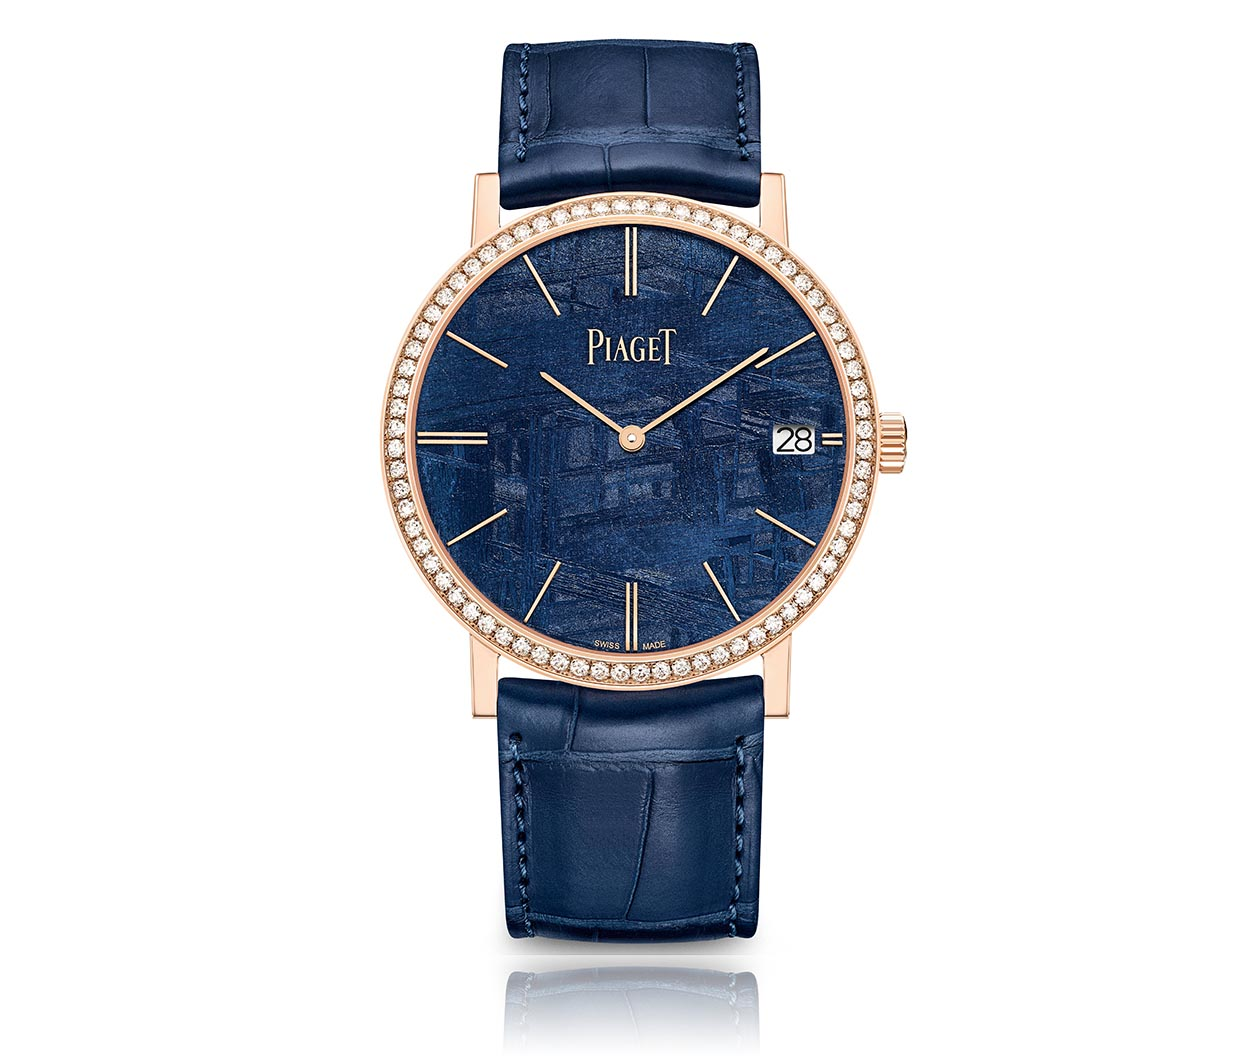 Piaget Altiplano watch G0A44052 Carousel 1 FINAL